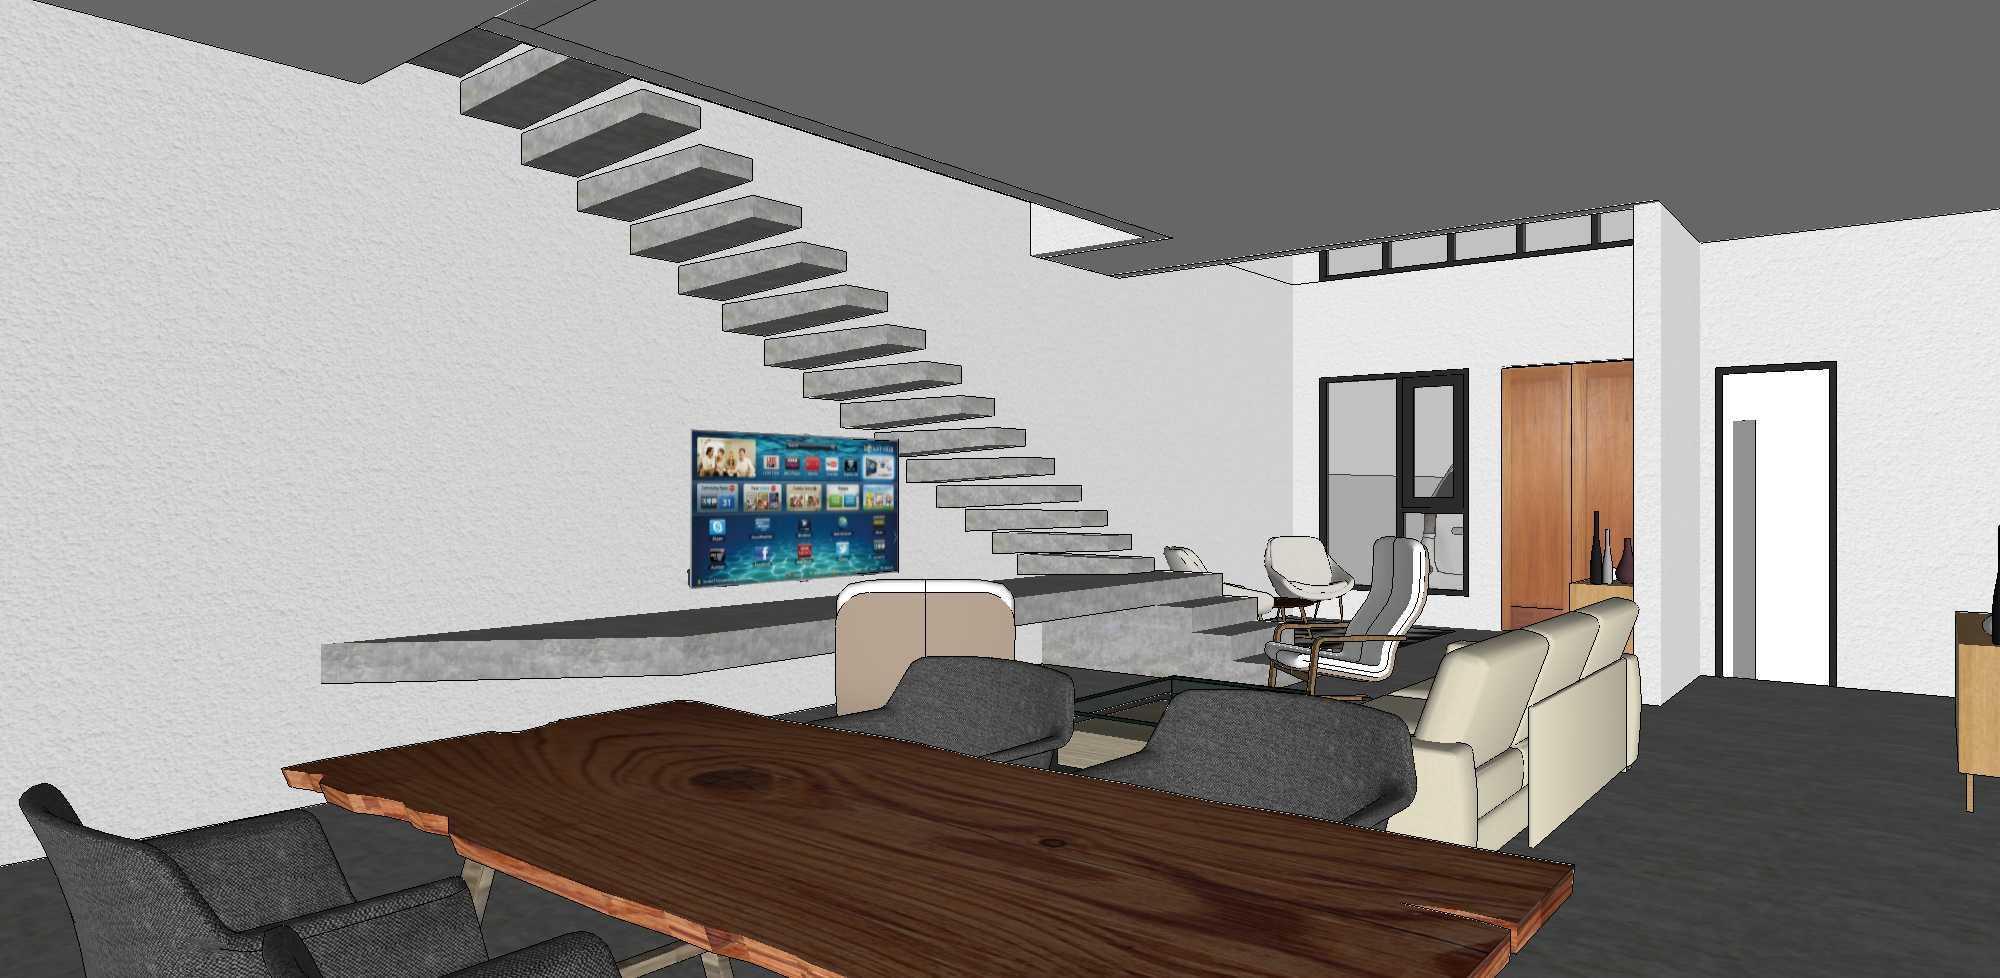 Zigzag Architecture Studio I House - Serpong Garden Cisauk, Tangerang, Banten, Indonesia Cisauk, Tangerang, Banten, Indonesia Zigzag-Architecture-Studio-I-House-Serpong-Garden   56170